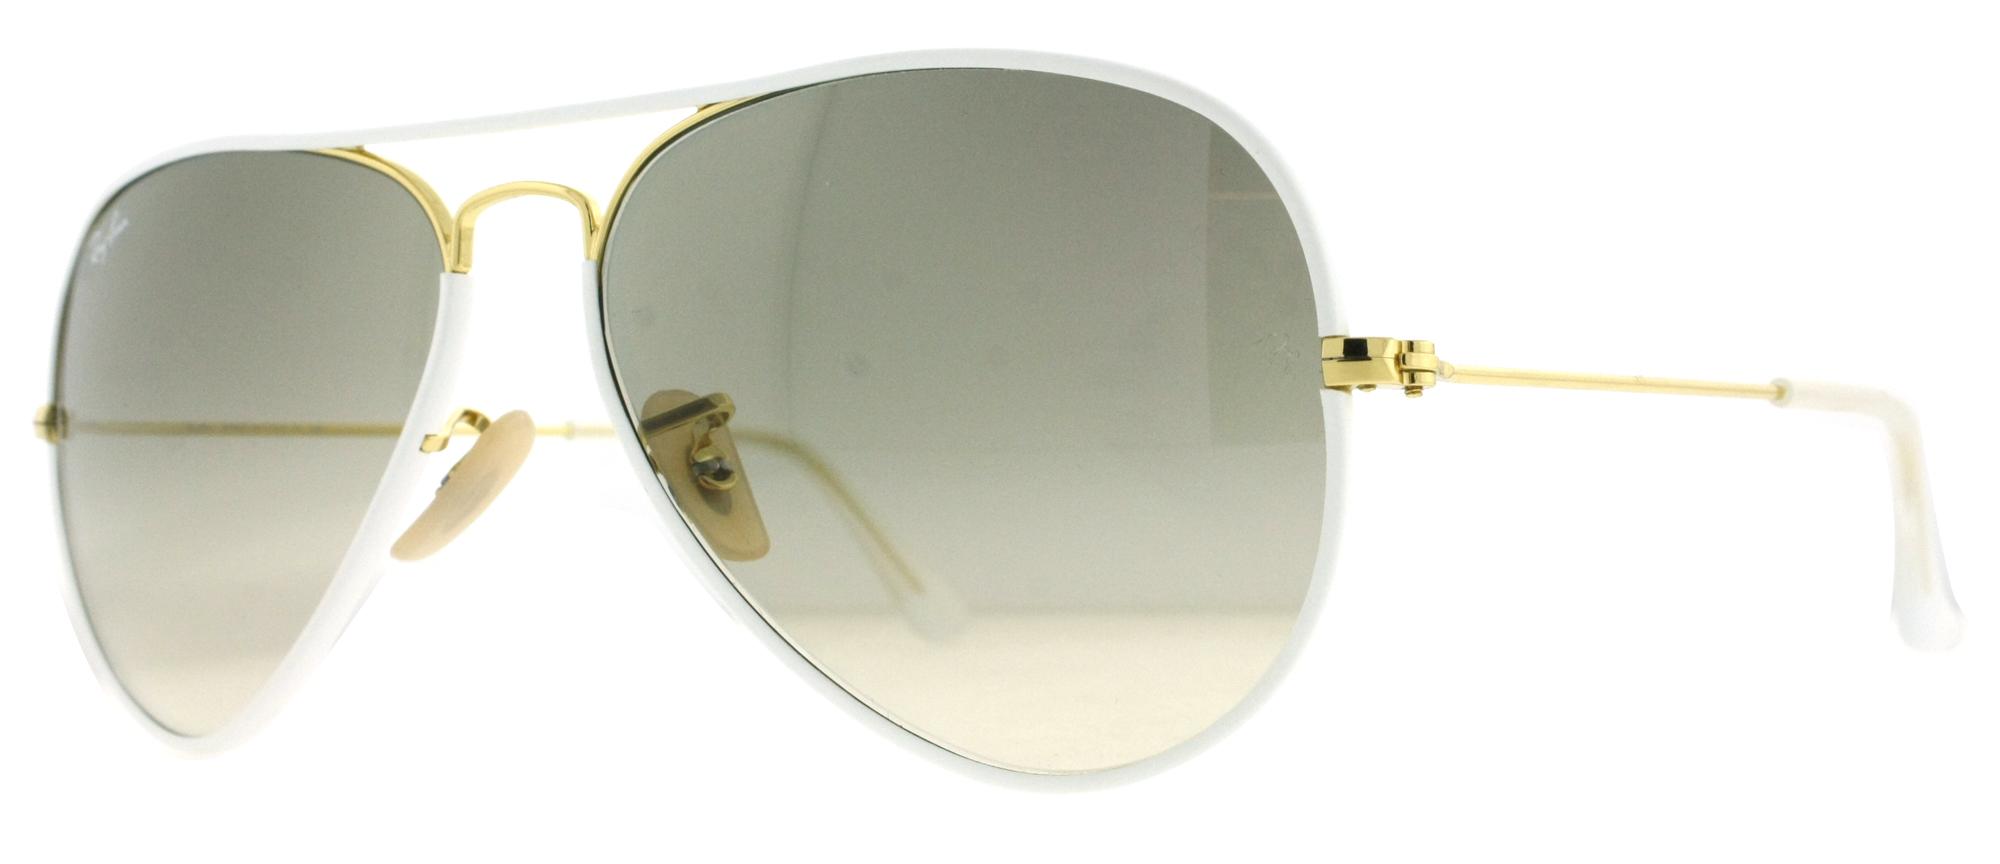 979392fcfad White Ray Ban Sunglasses Ebay